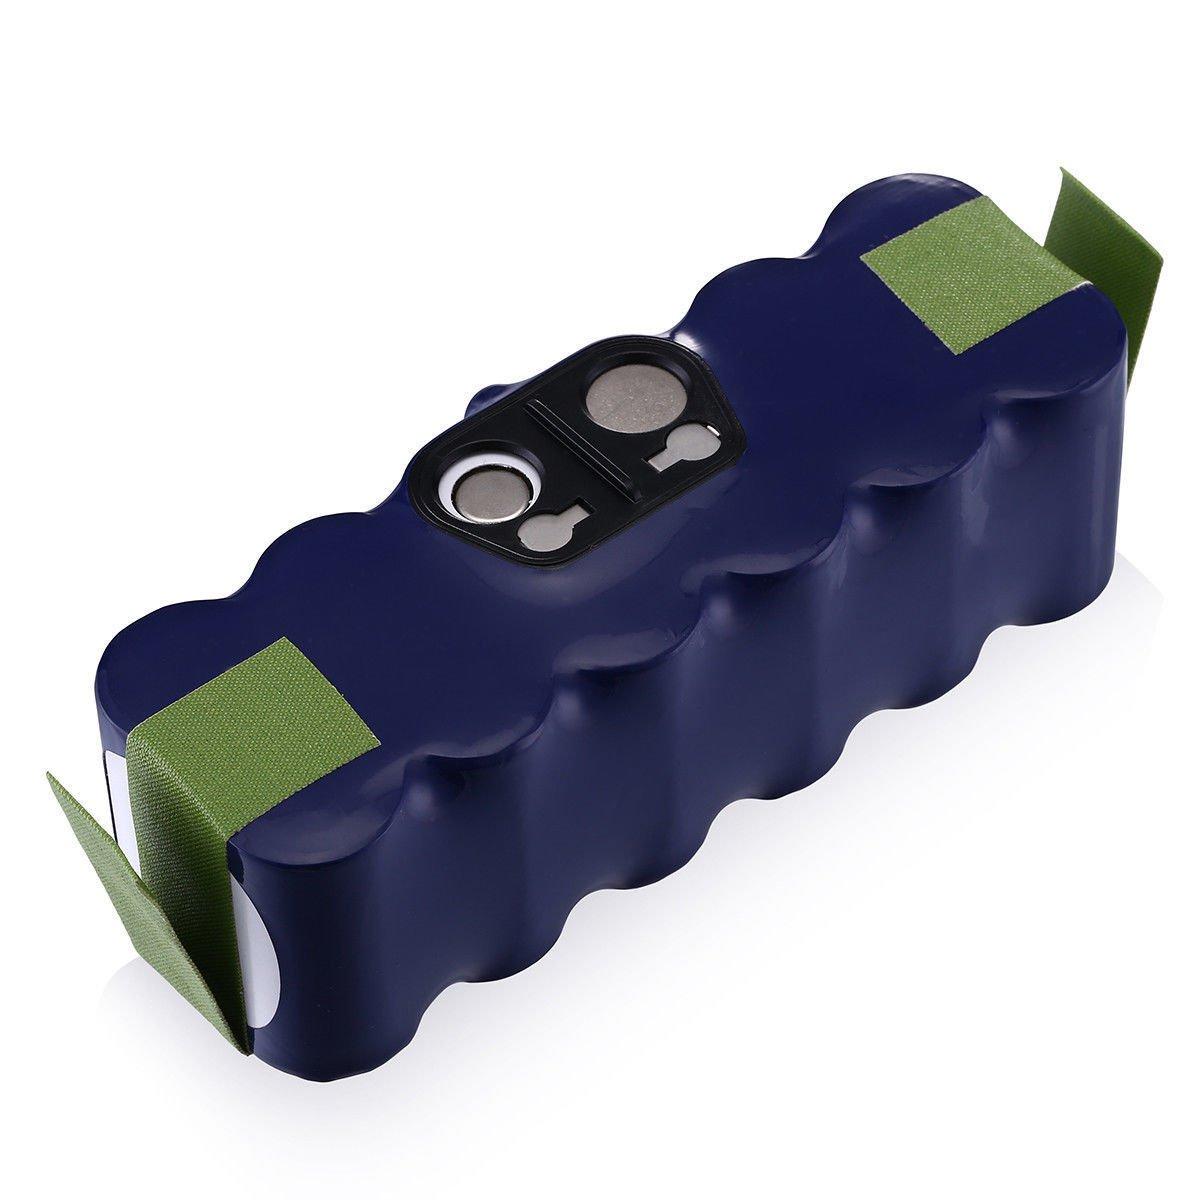 3500mAh NI-MH Vacuum Cleaner Battery For iRobot Roomba 700 760 770 780 790 800 870 880